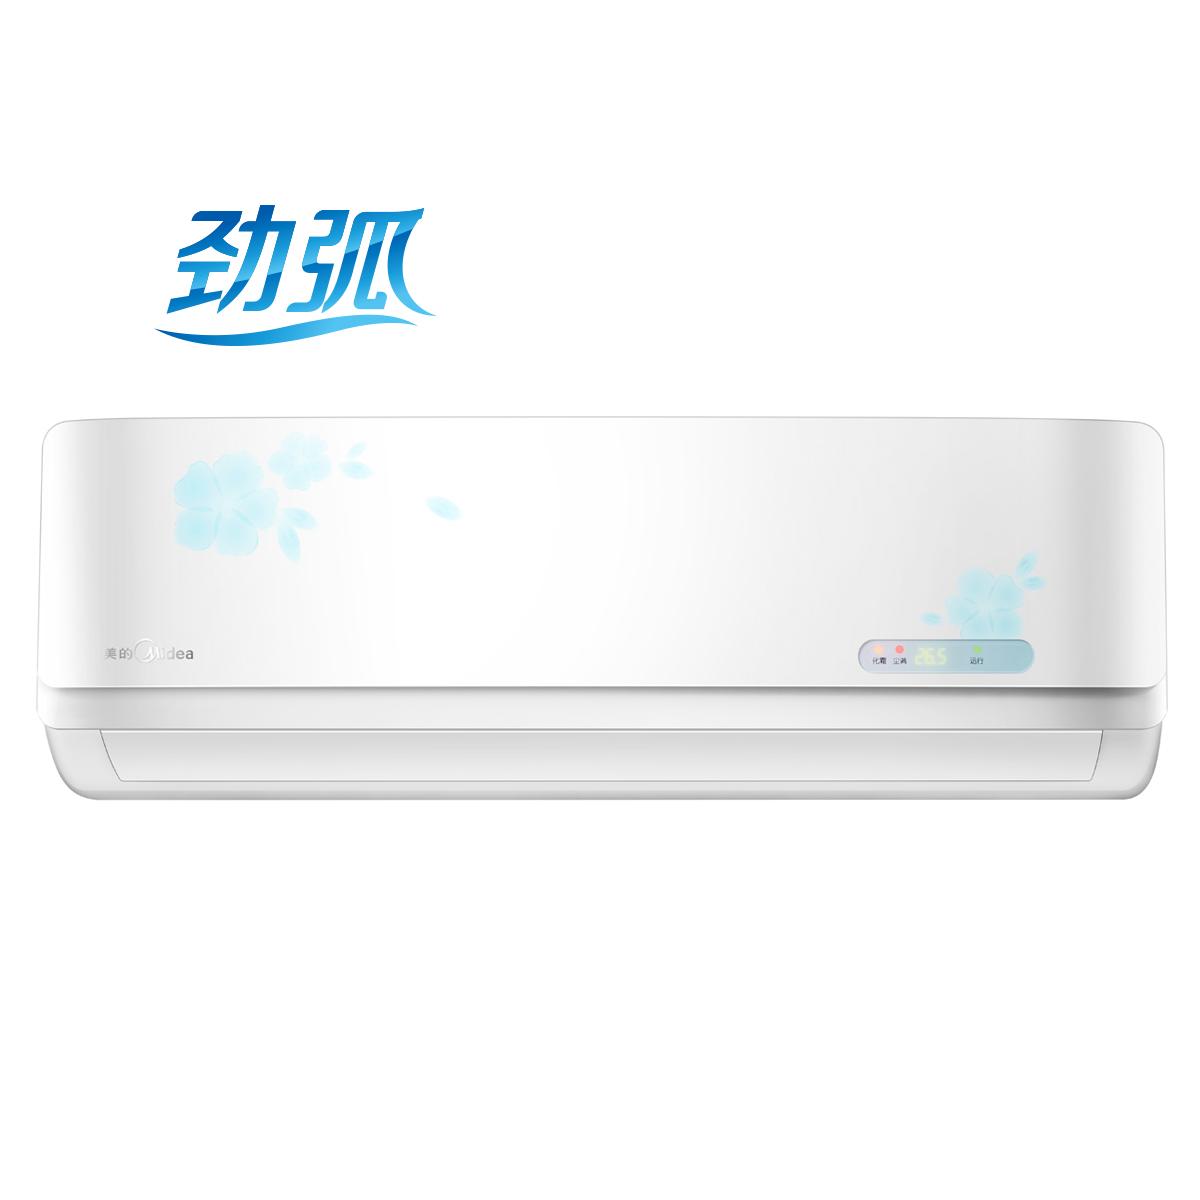 Midea/美的 KFR-23GW/DY-ID(D2) 家用空调套机 说明书.pdf